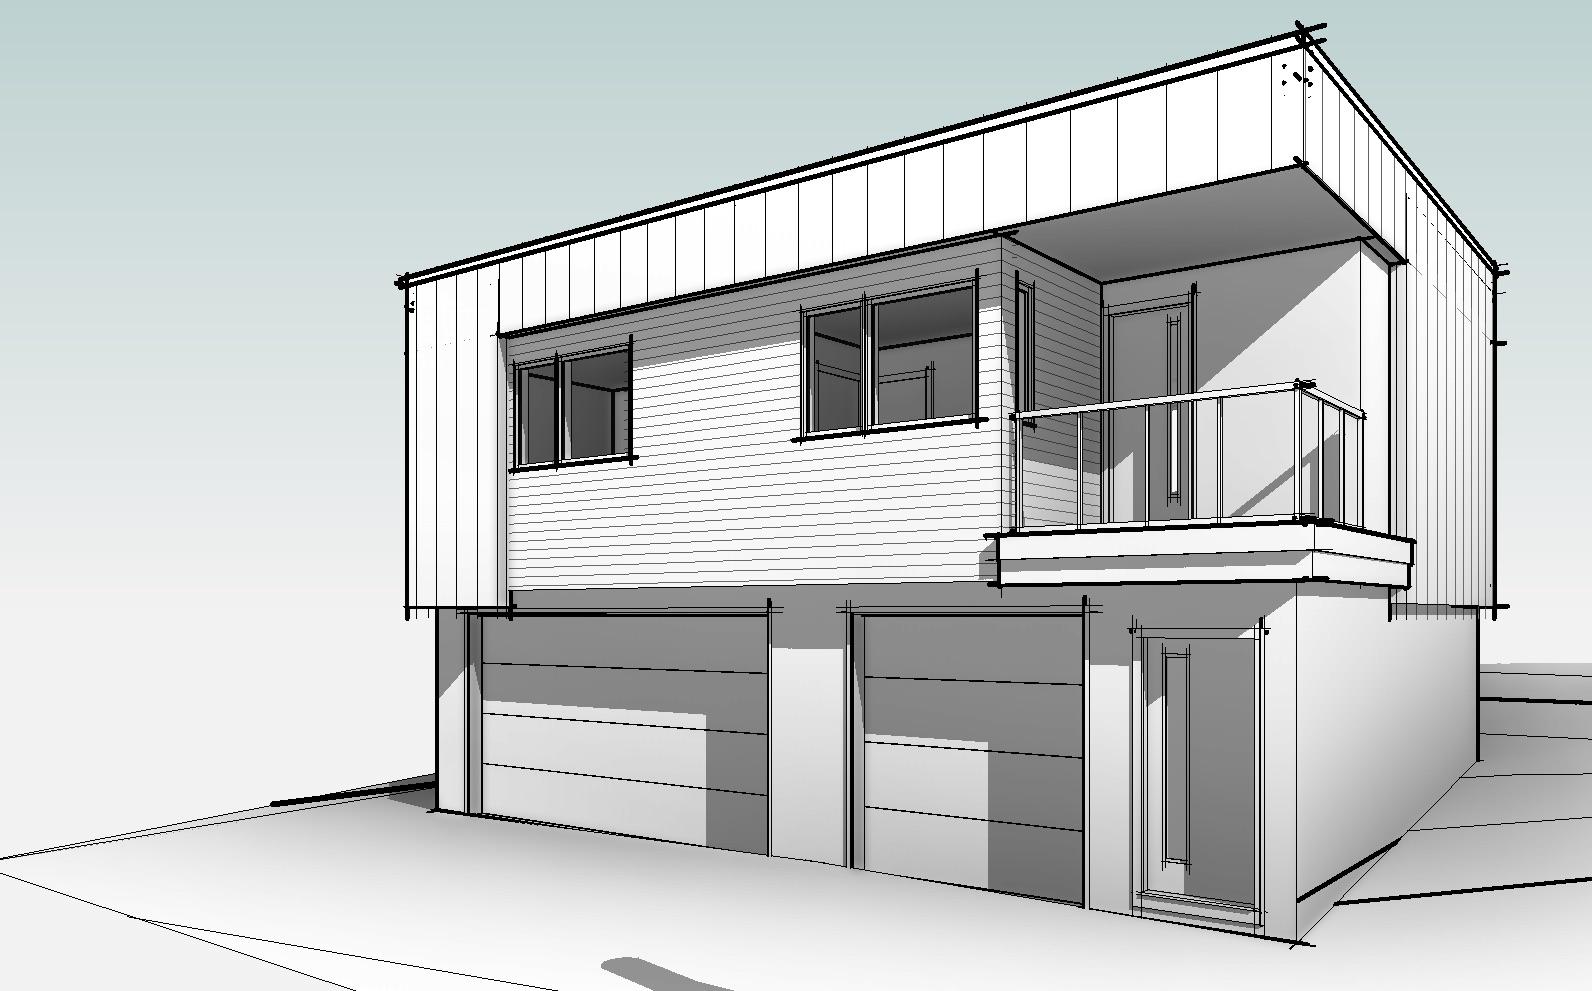 Proposed Garage Suite